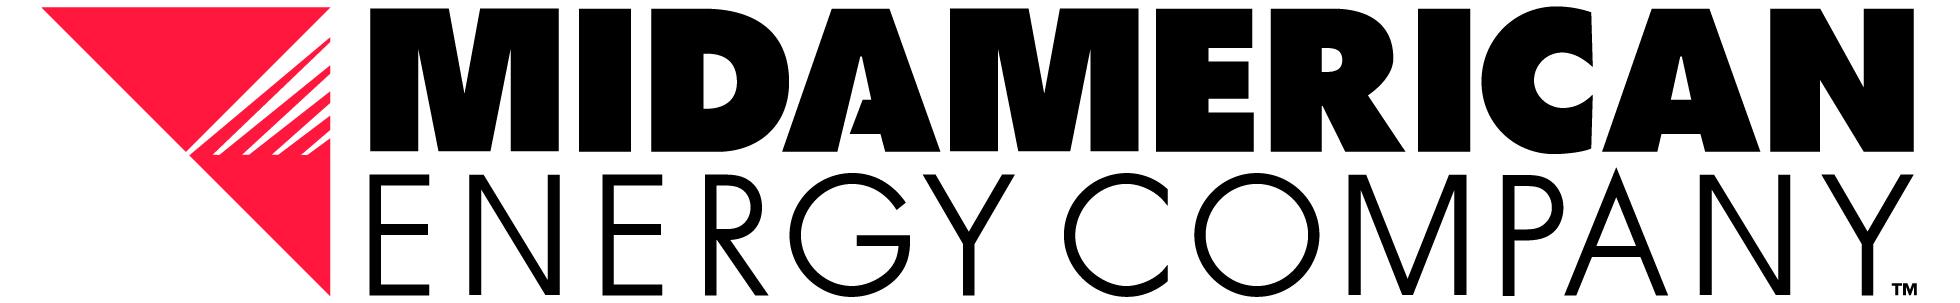 MidAmerican_Energy_logo2_139D56F9F0A66